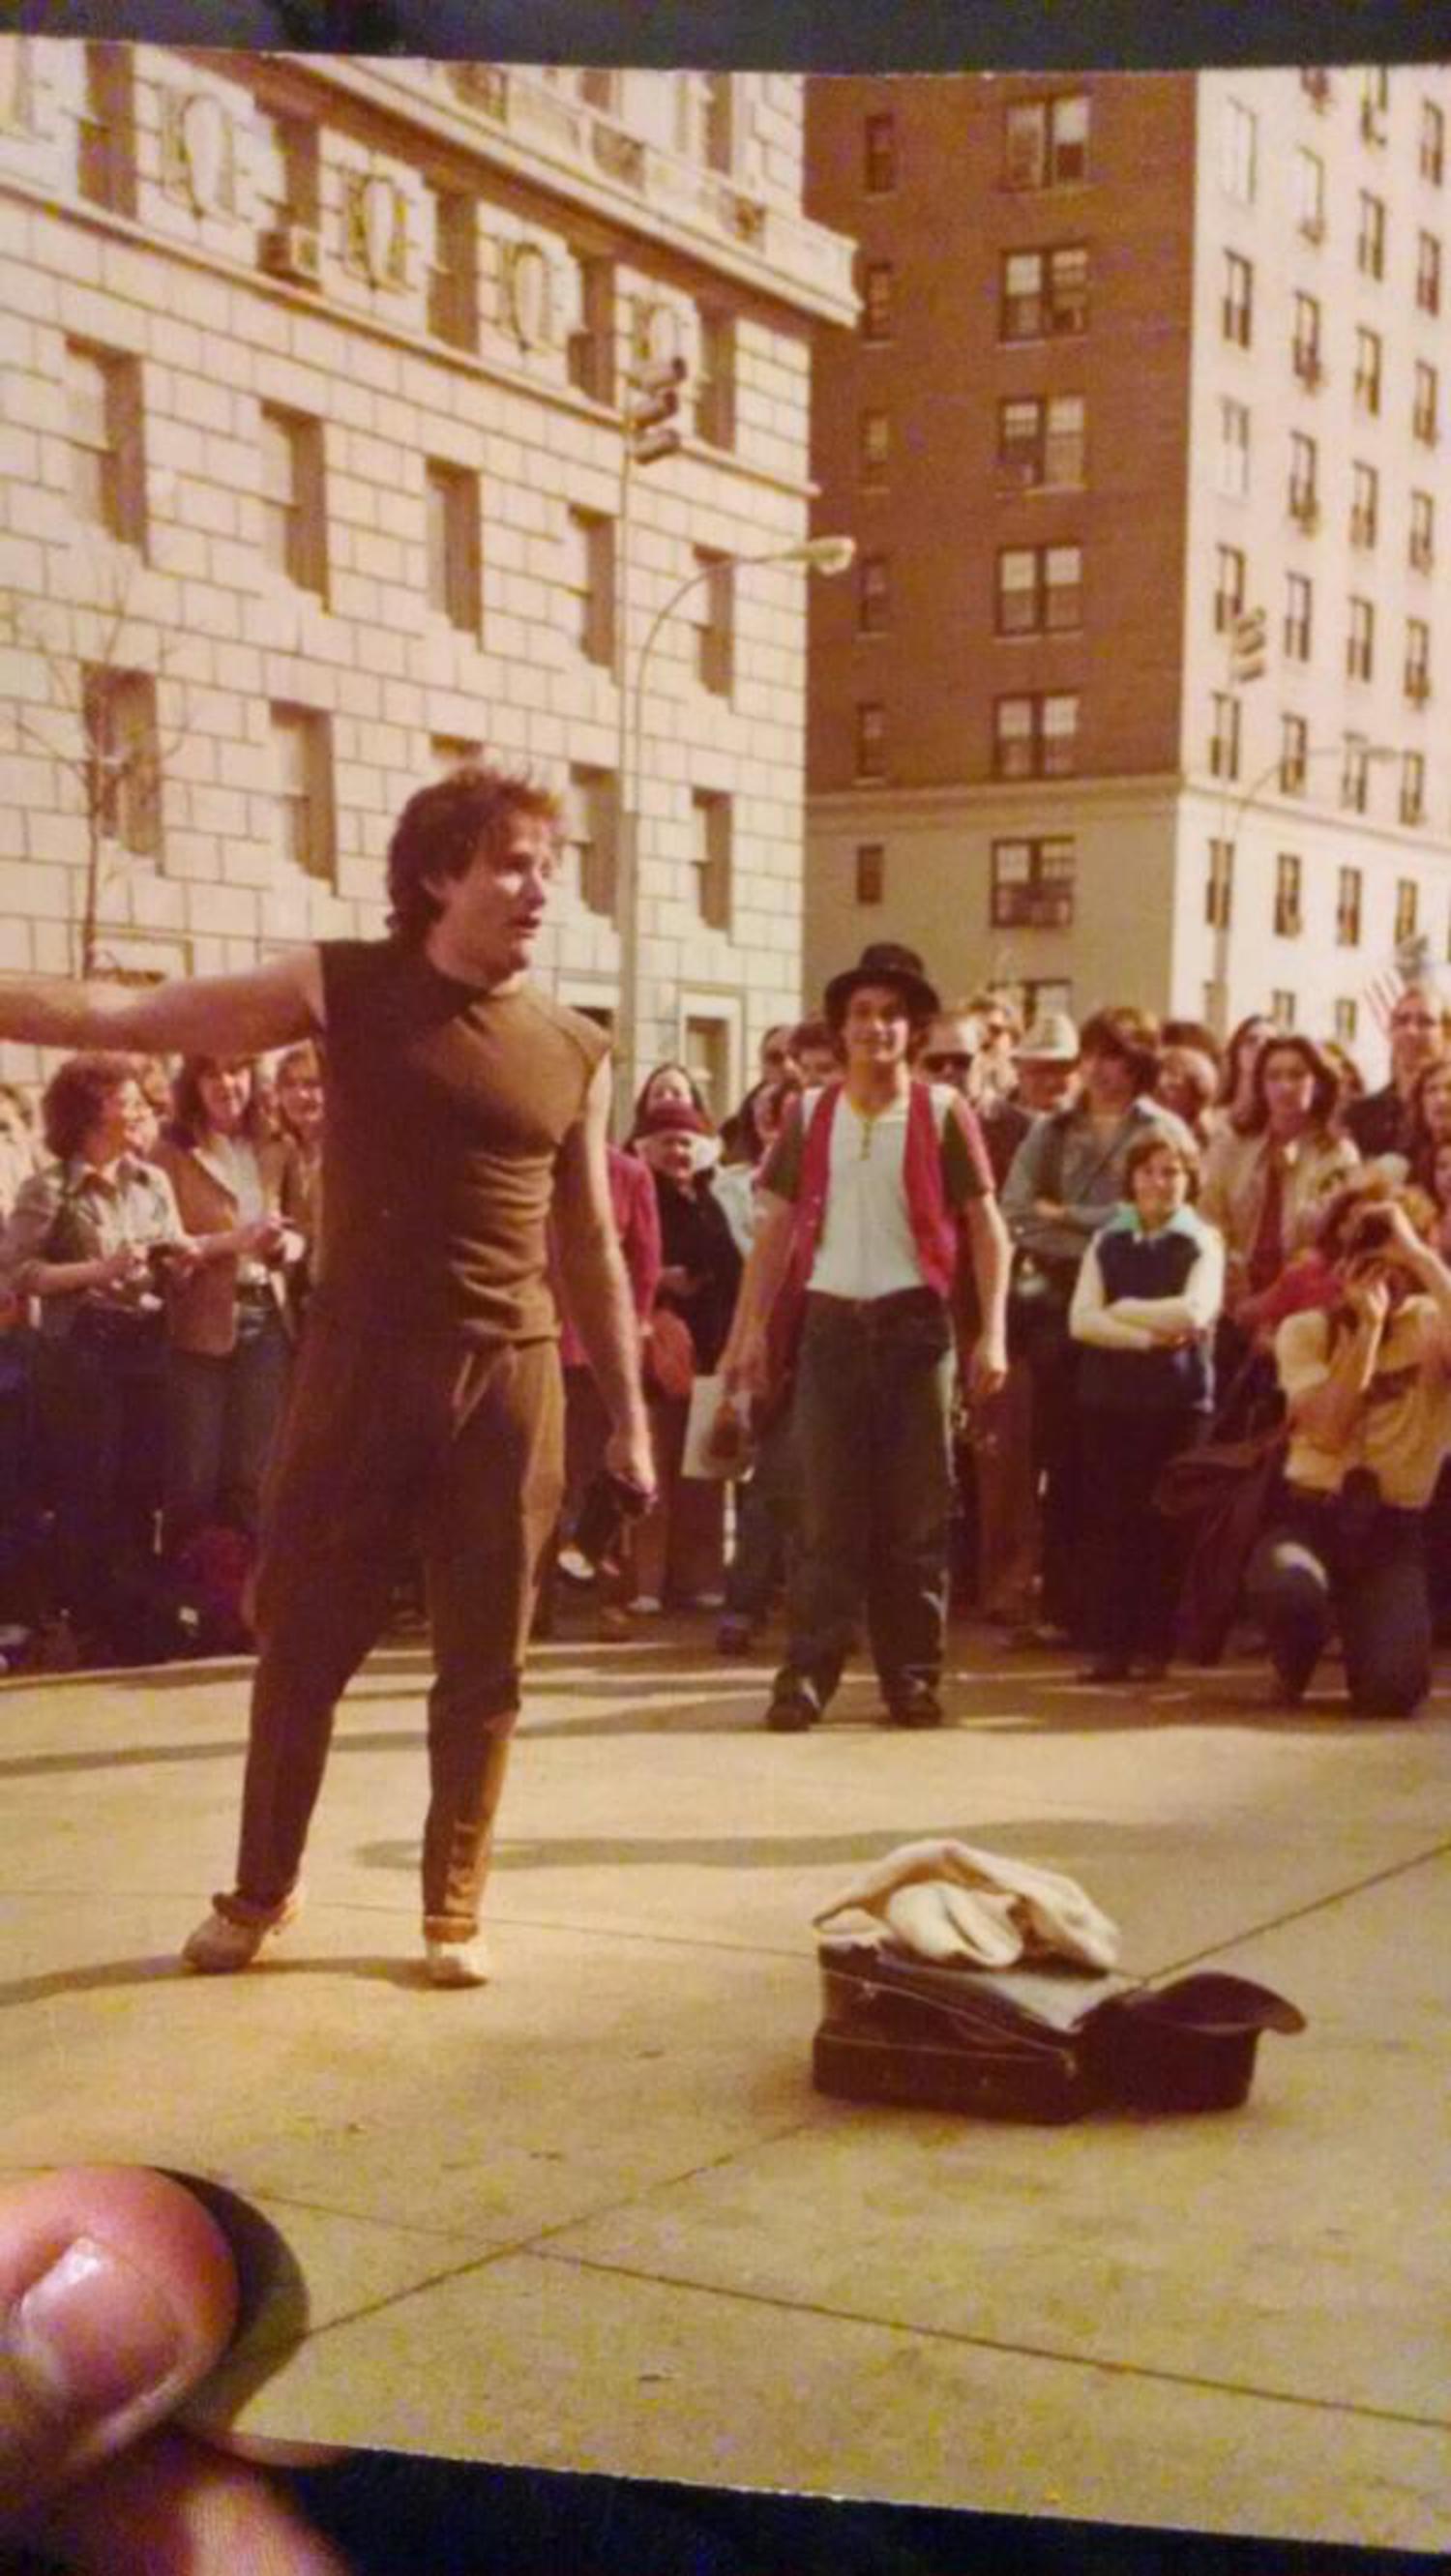 Robin Williams Street Performance in New York City, 1979